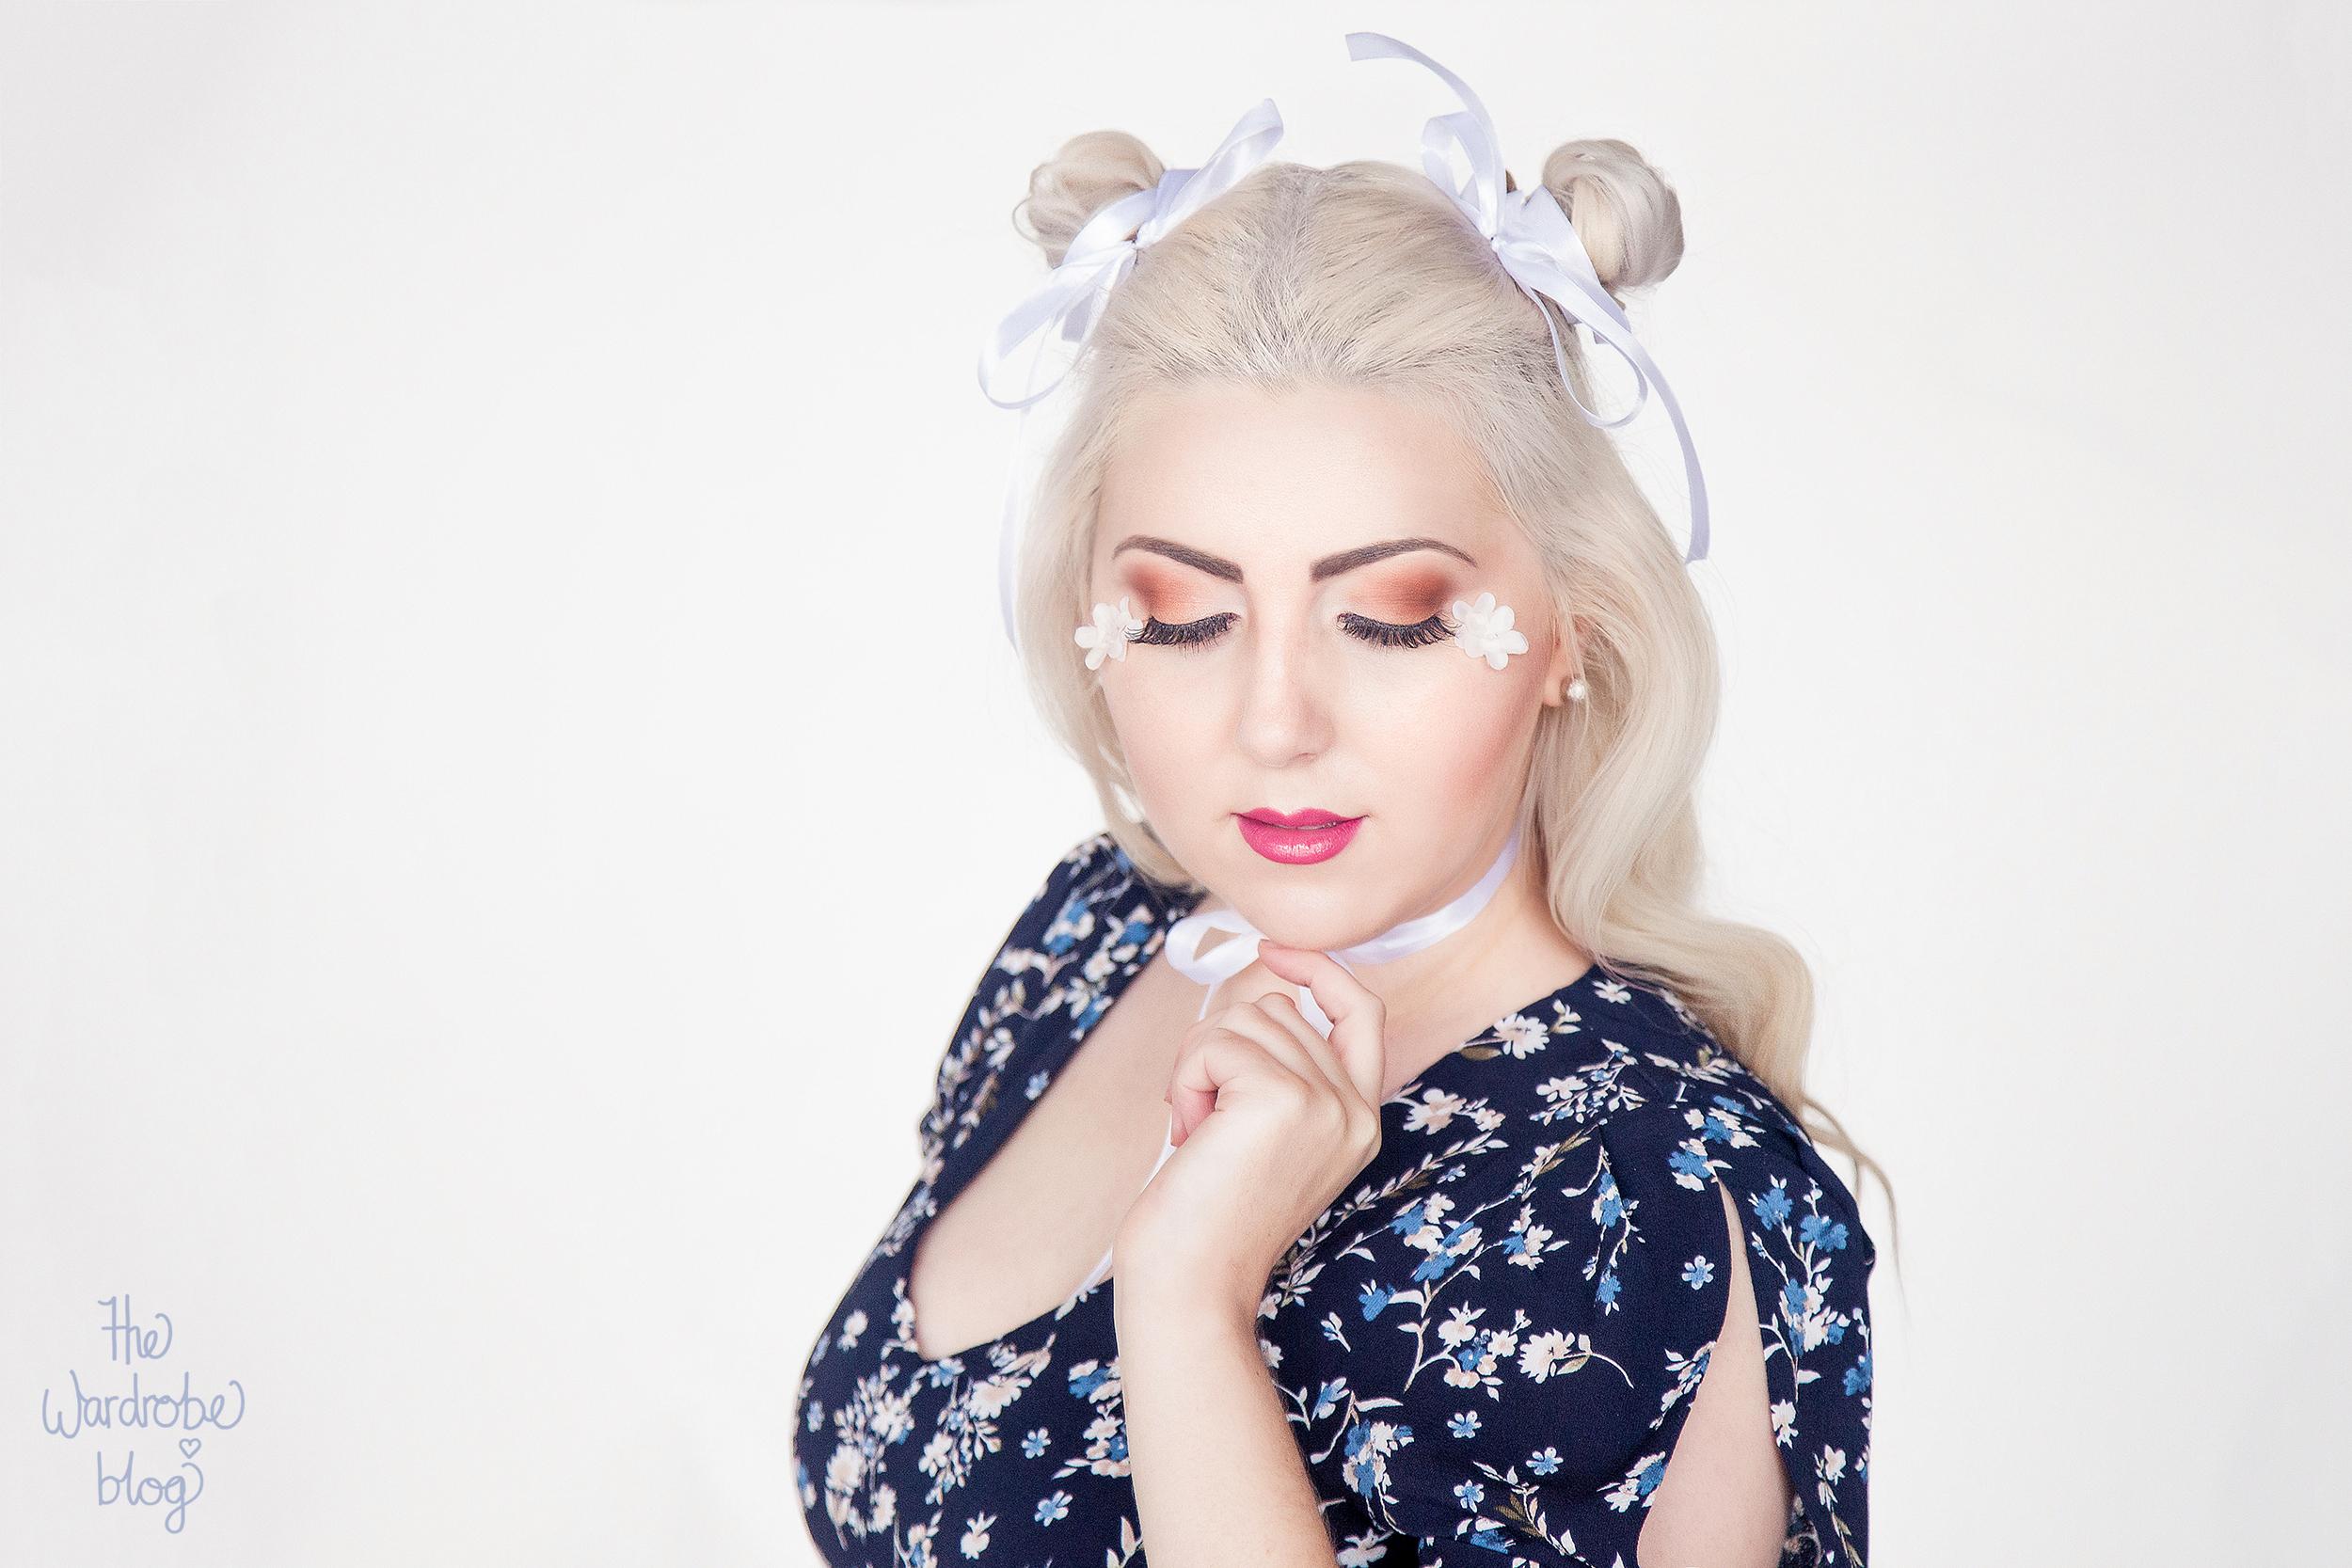 Pagani-Ribbons-Floral-White-Makeup